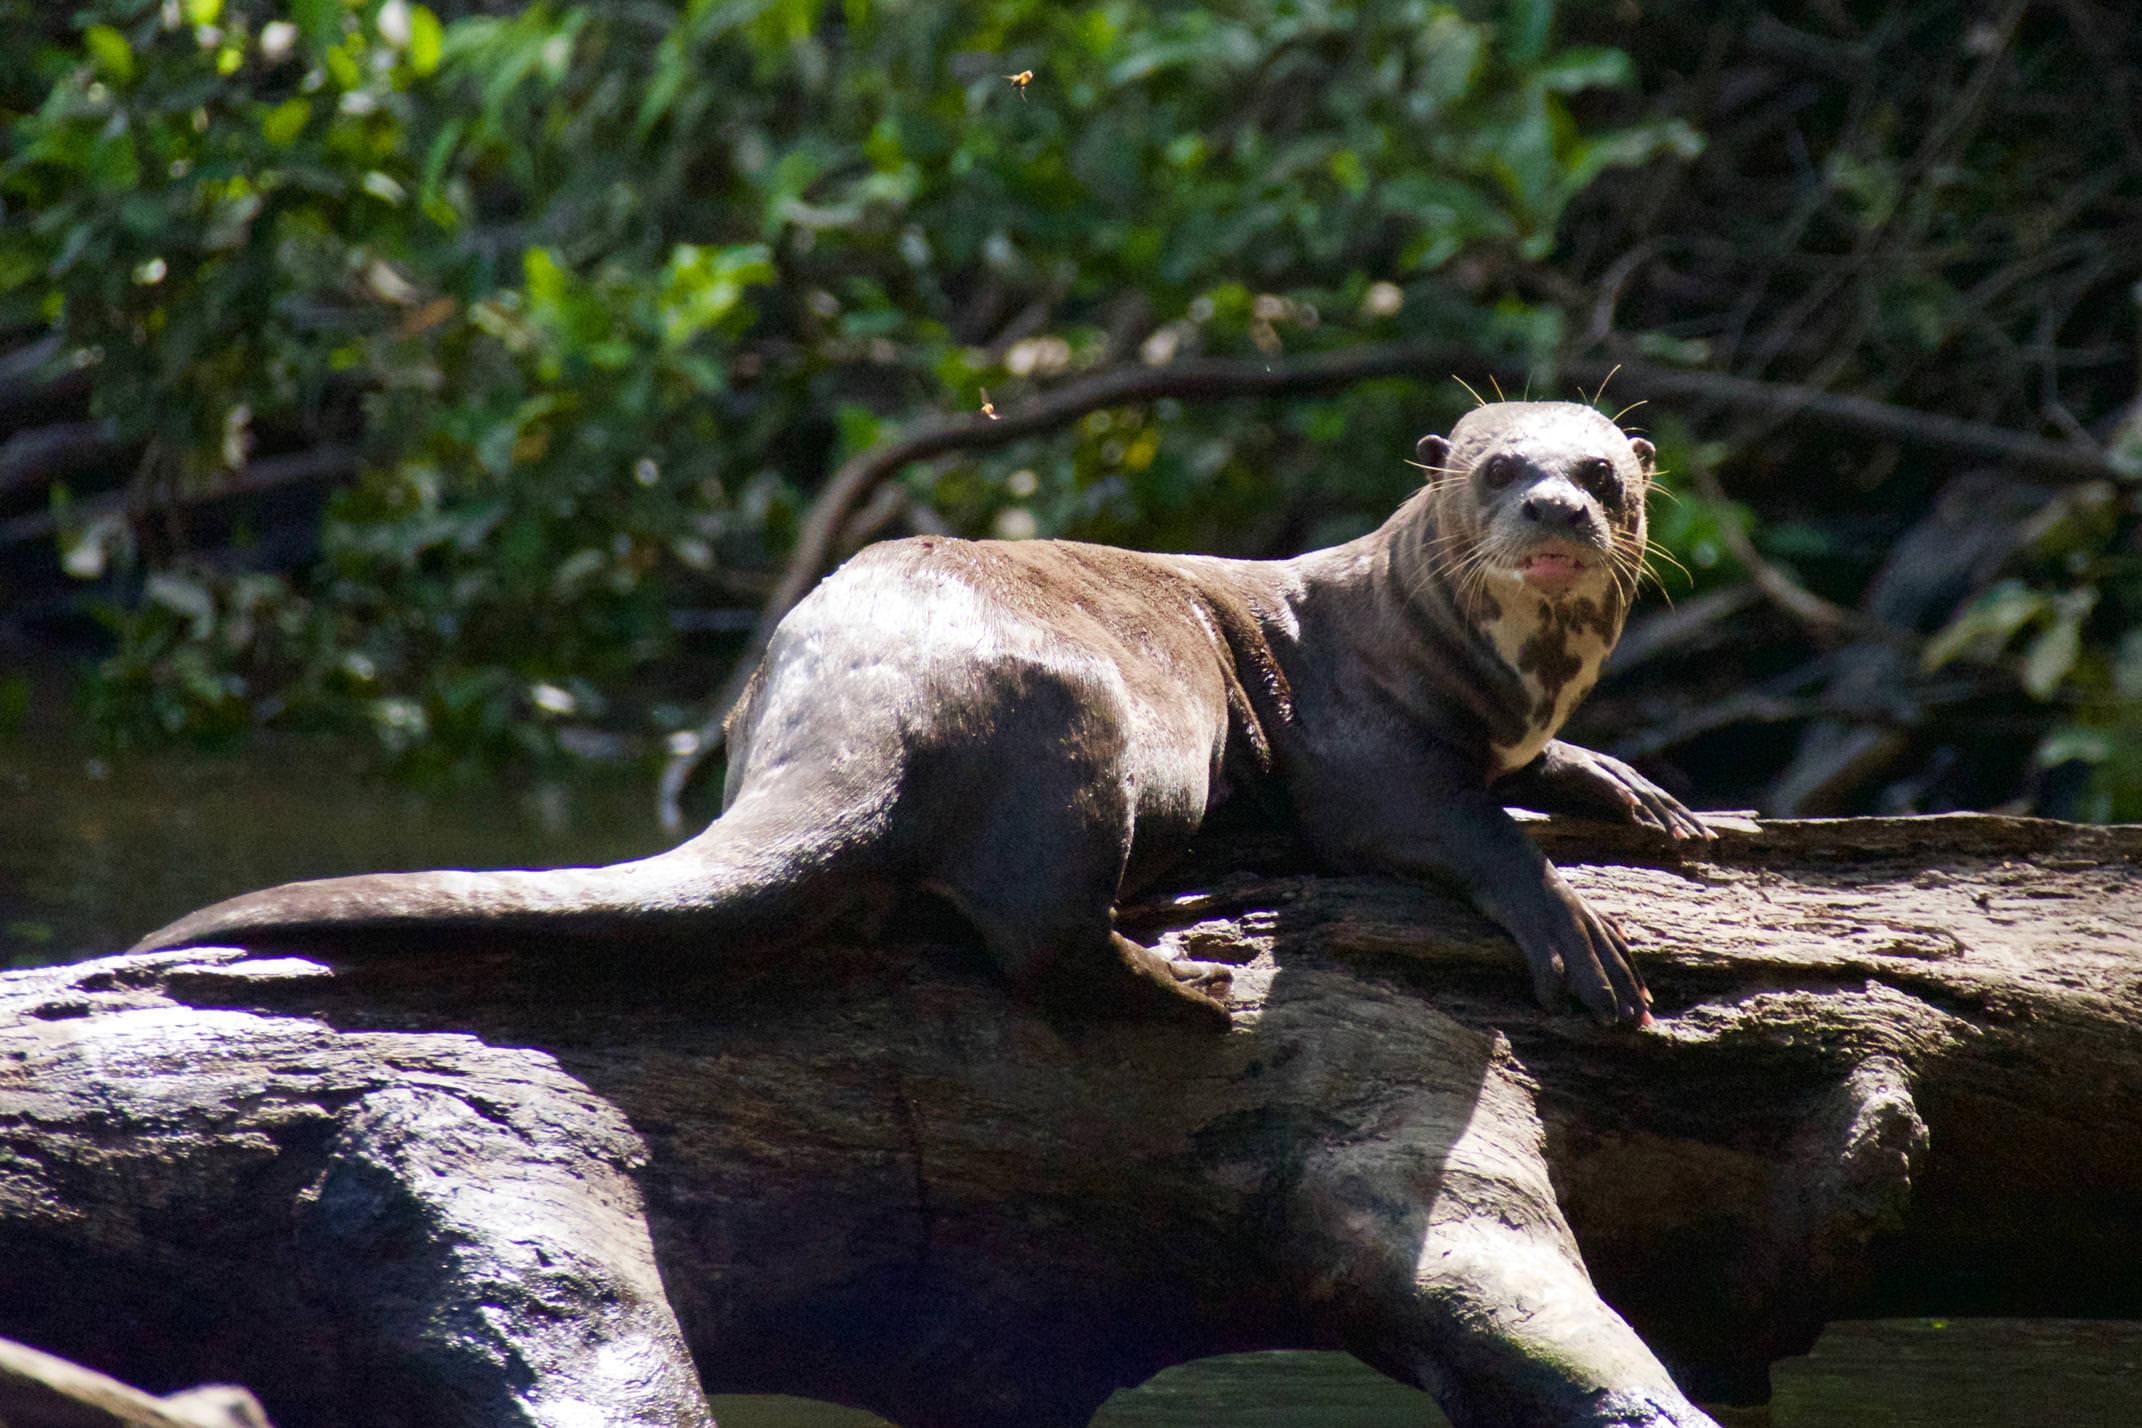 Brazil amazon cristalino lodge giant river otter copyright thomas power pura aventura